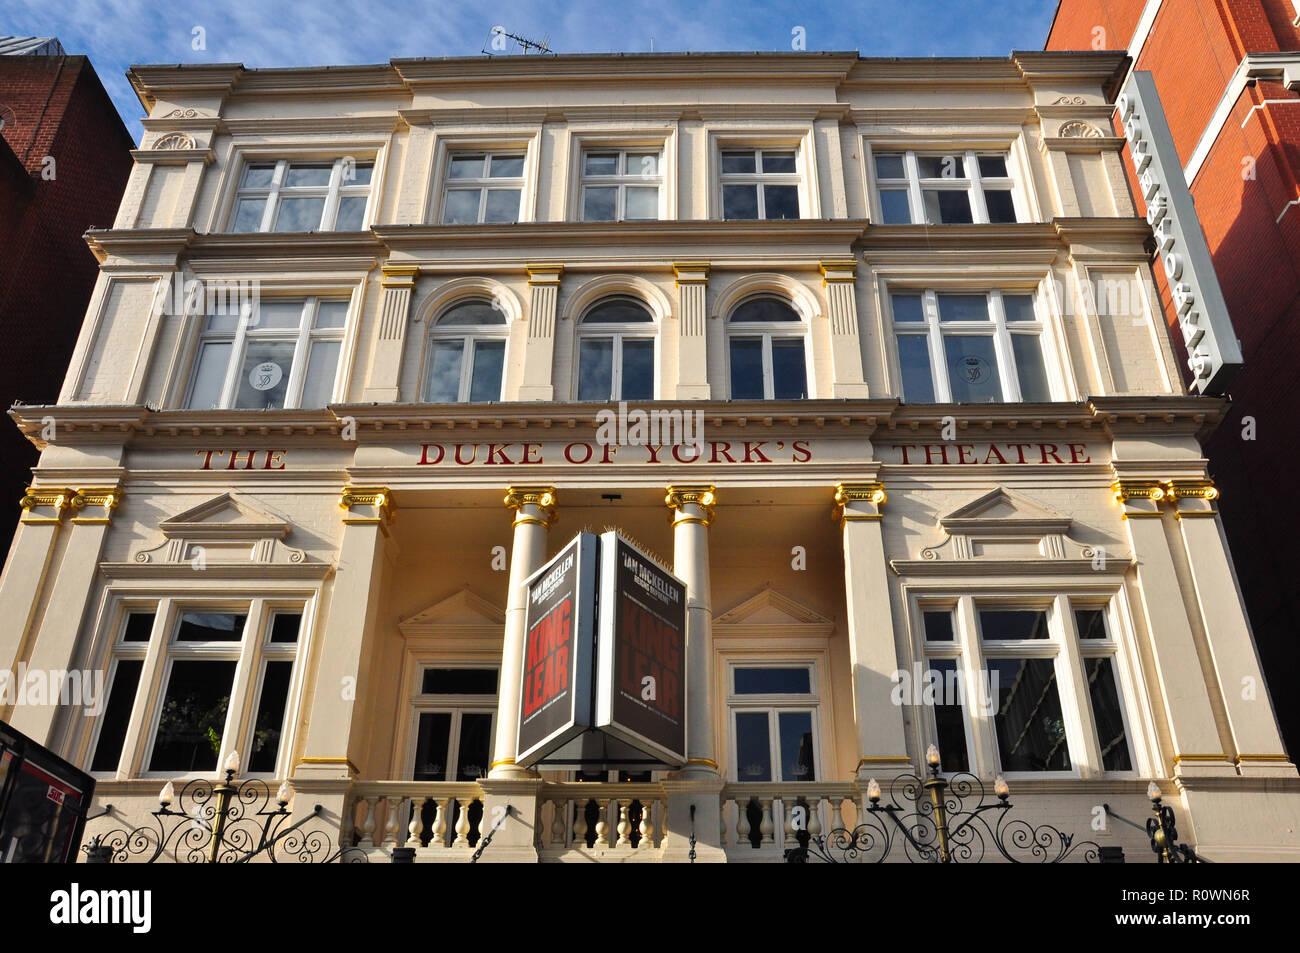 Duke of York's Theatre, St Martin's Lane, London, England, UK - Stock Image